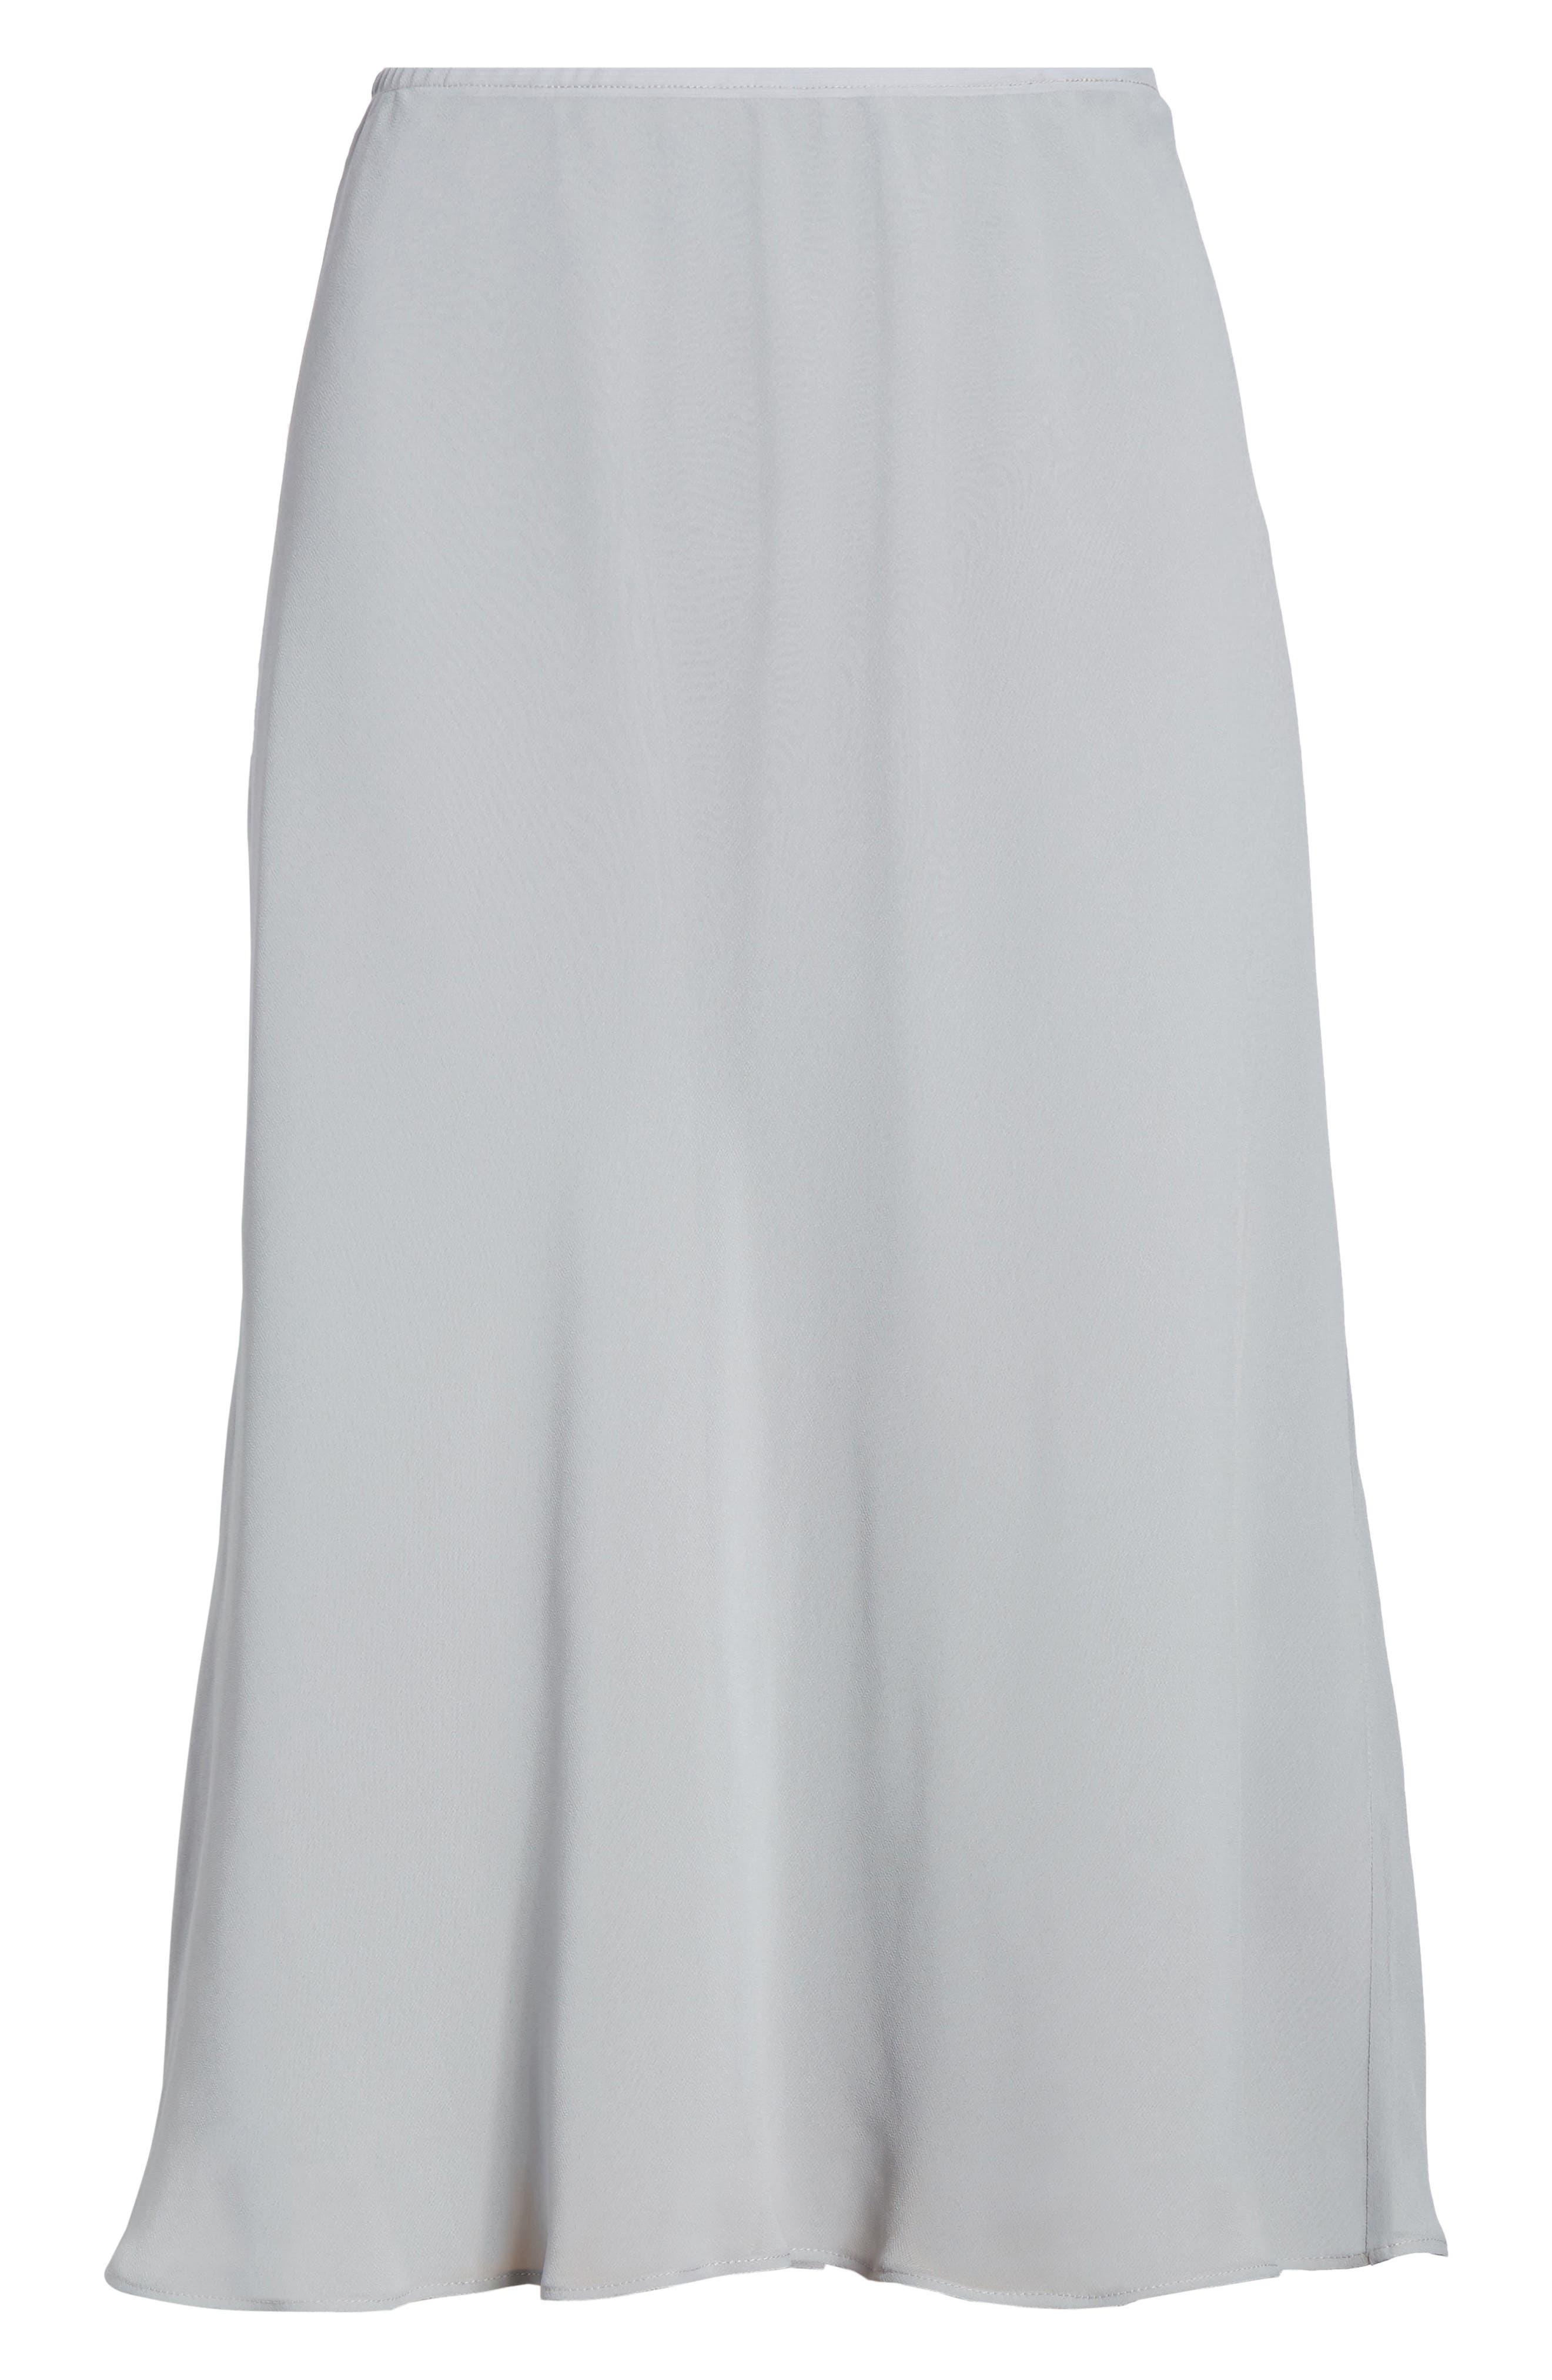 Paired Up Skirt,                             Alternate thumbnail 6, color,                             050